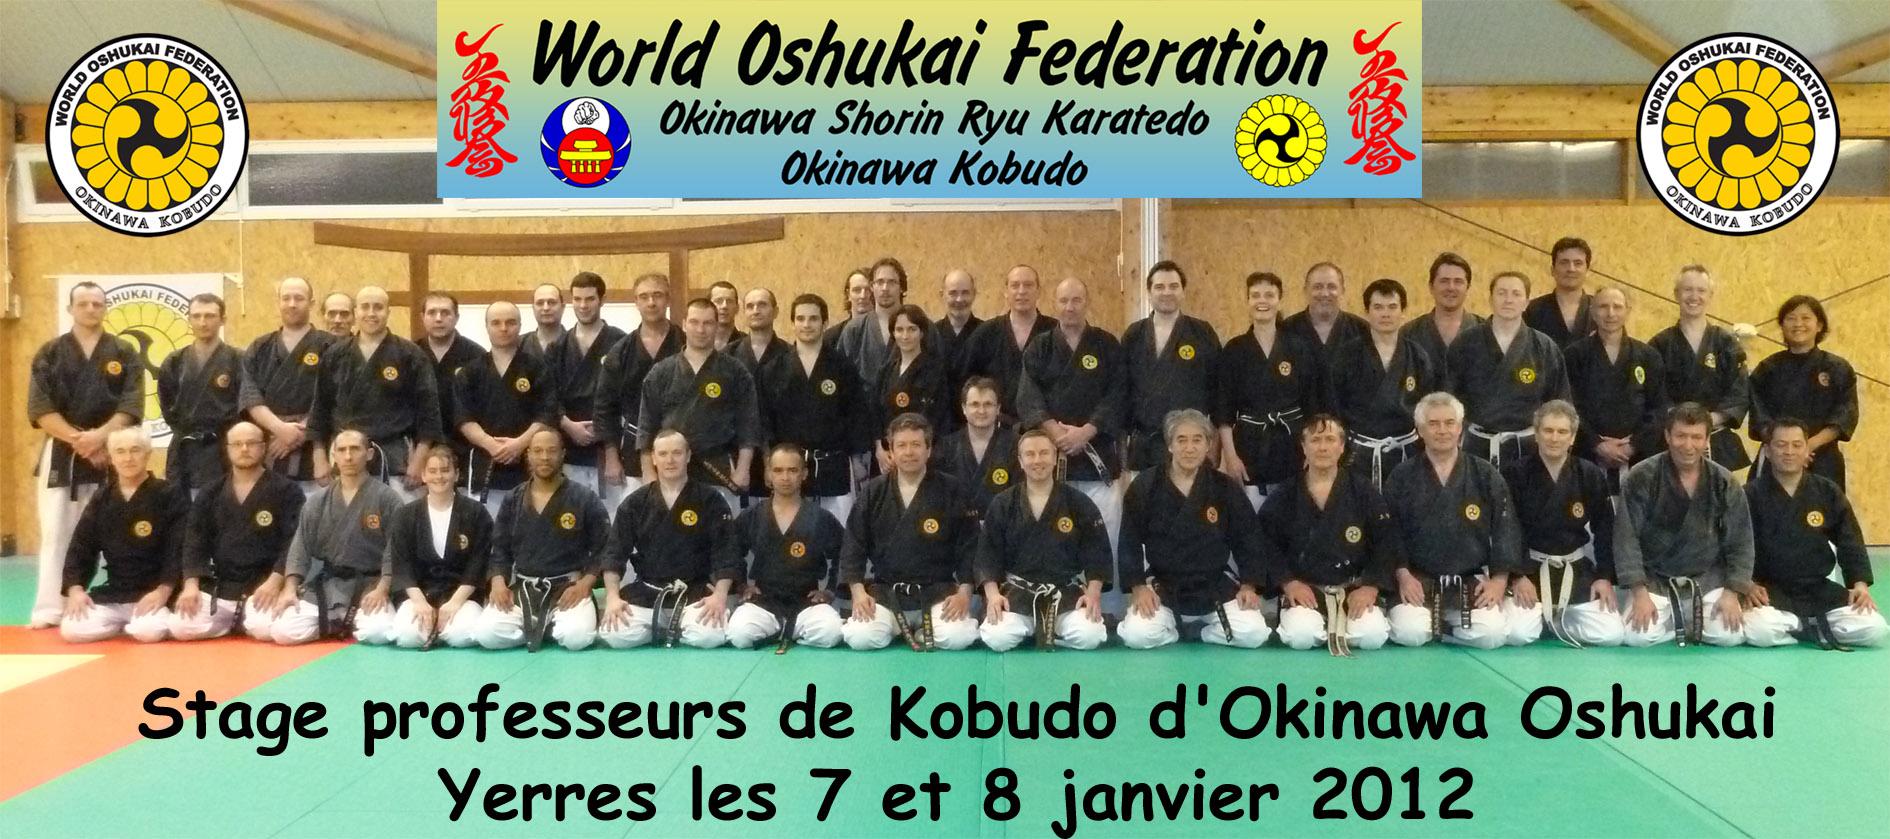 Stage Professeurs Kobudo YERRES Janv 12 2012_01_08-prof-kobudo-yerres-p